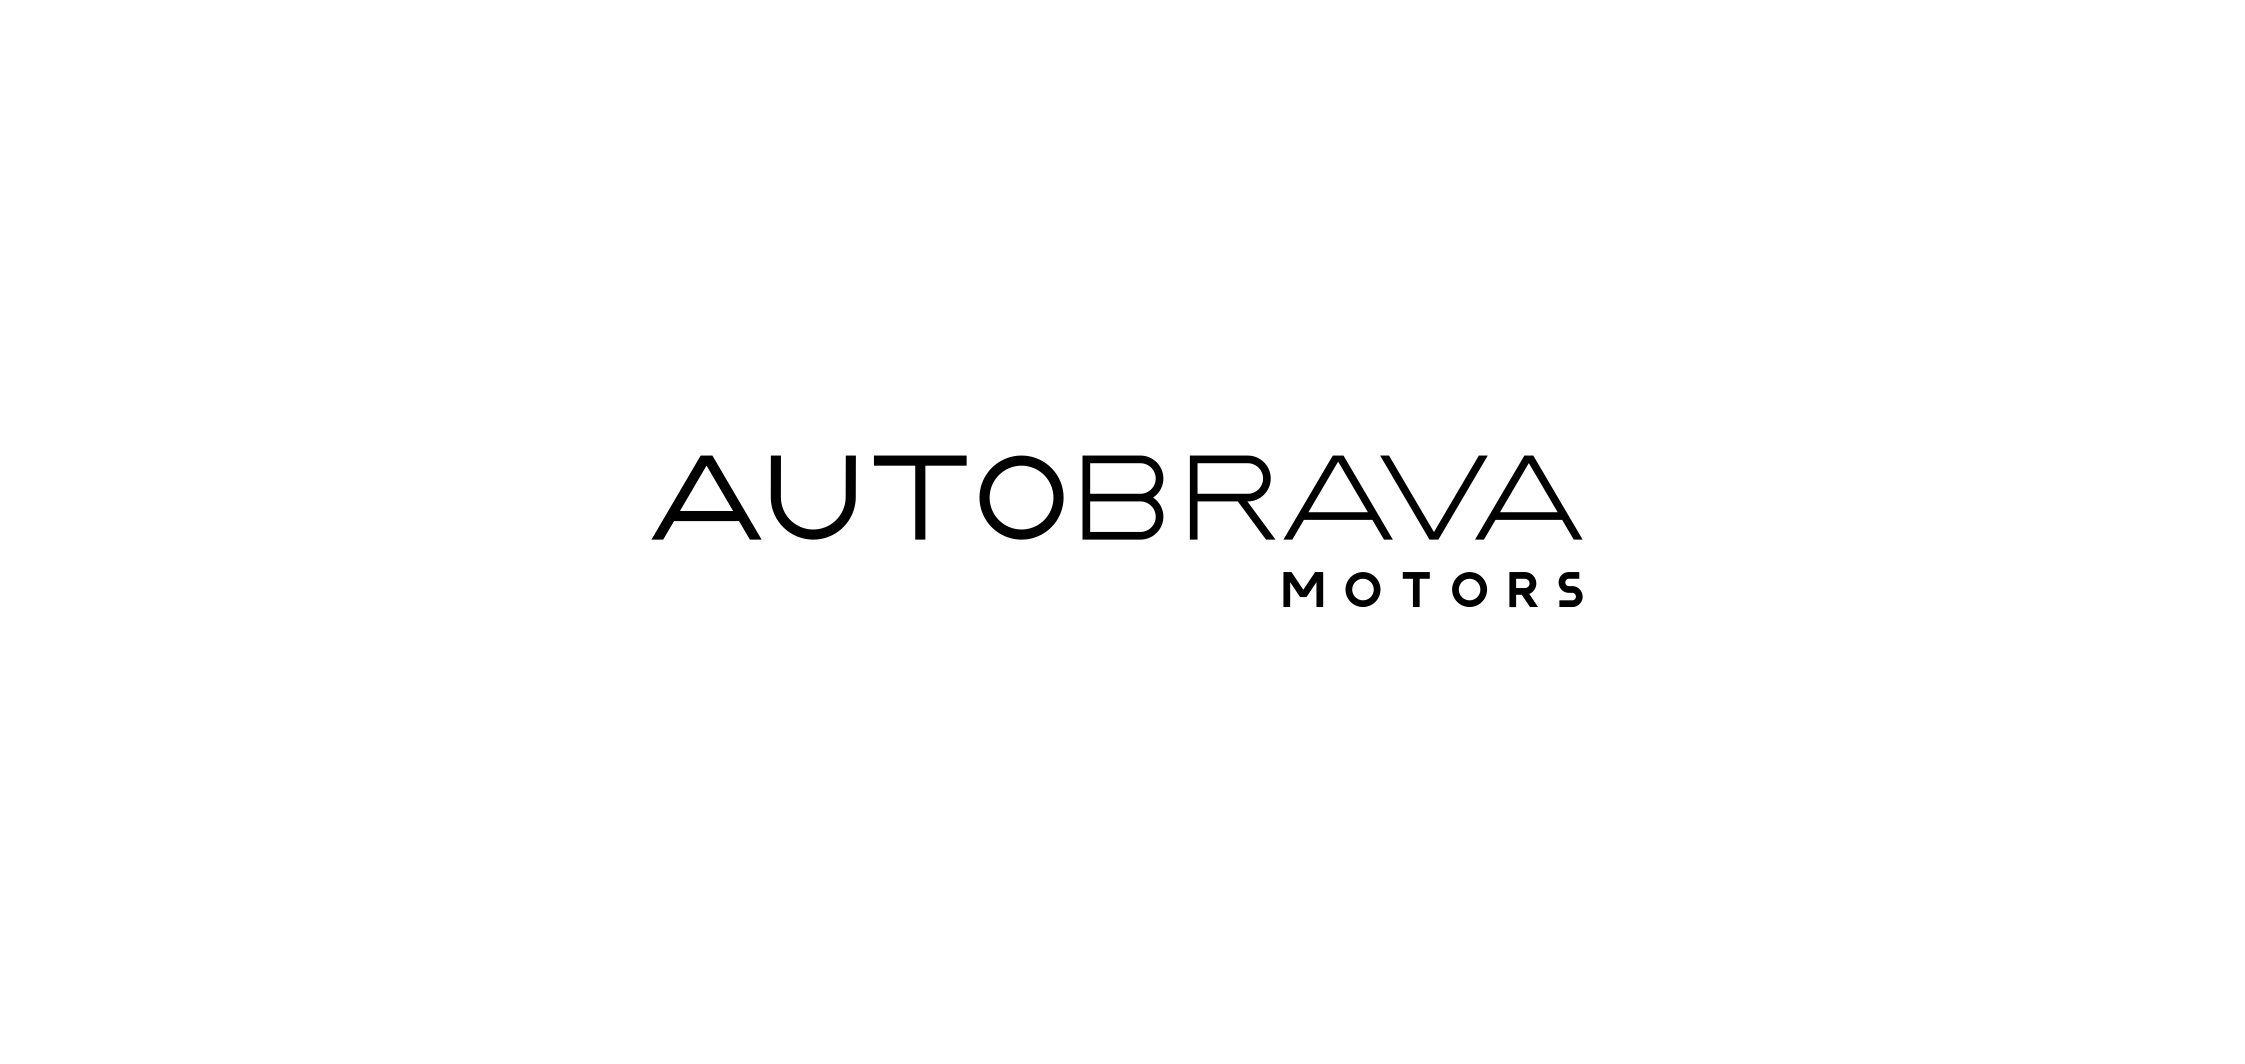 autobrava motors logotipo atnaujinimas